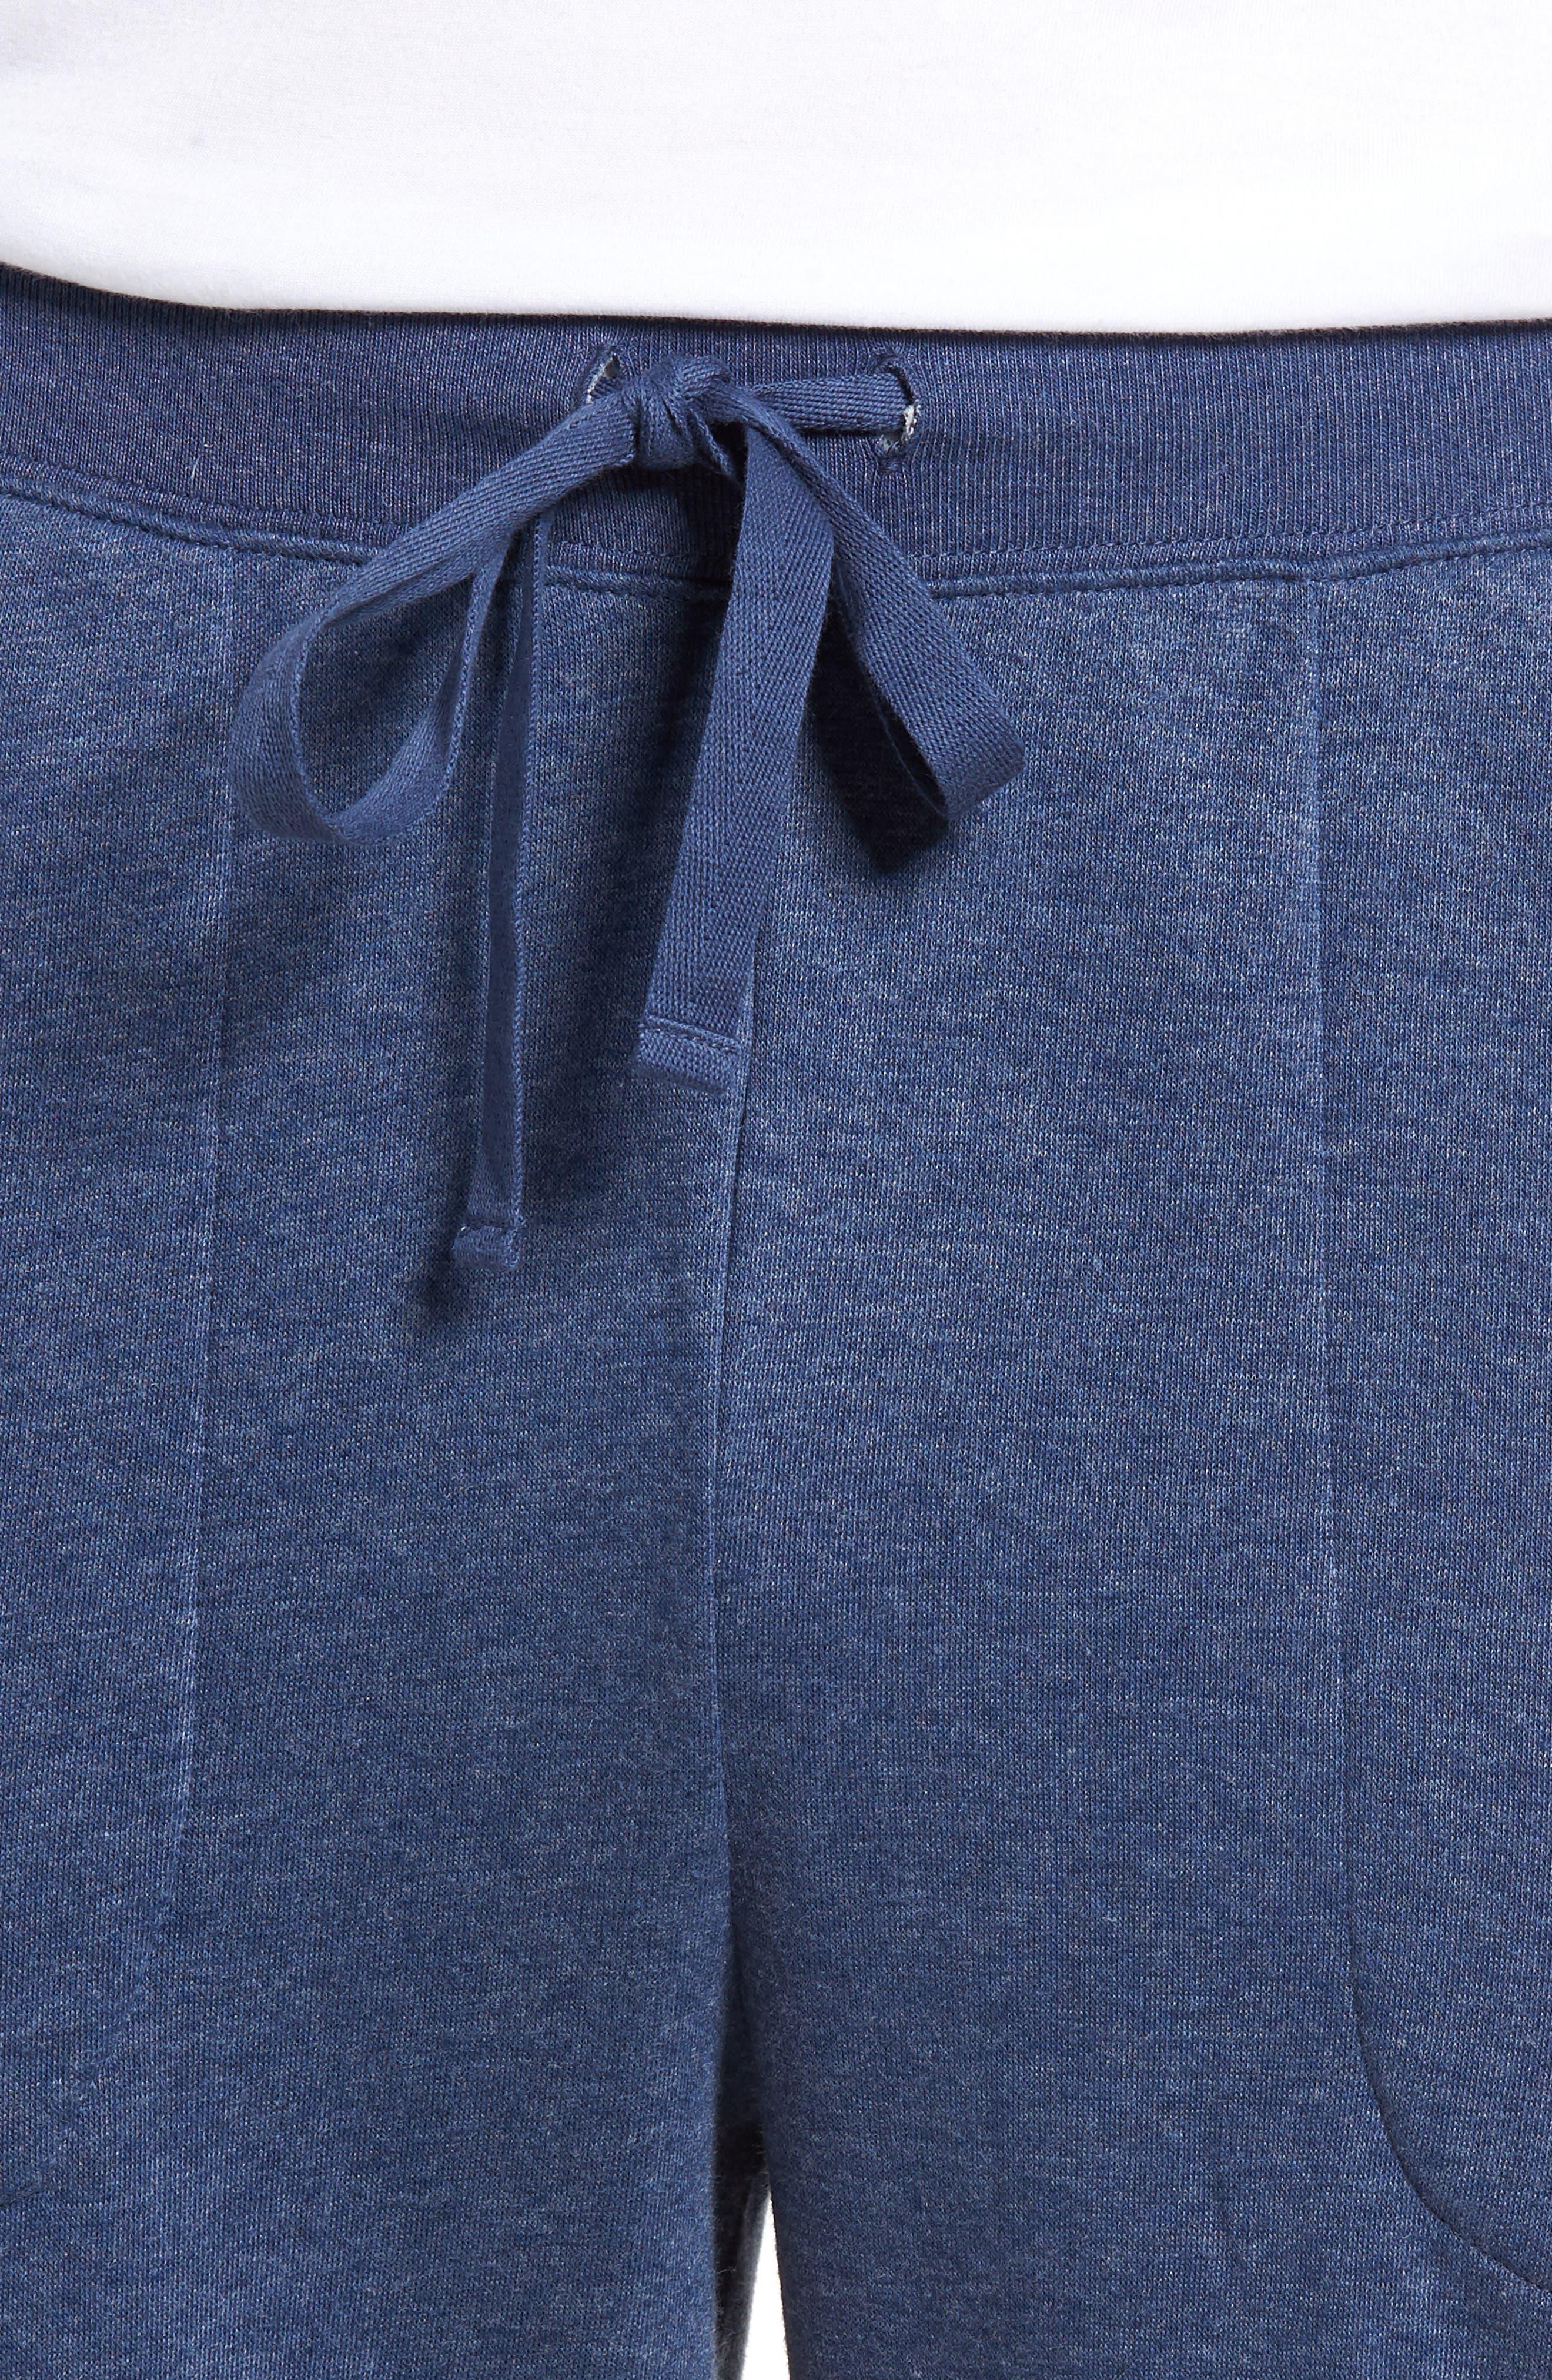 Brushed Jersey Cotton Blend Jogger Pants,                             Alternate thumbnail 4, color,                             Blue